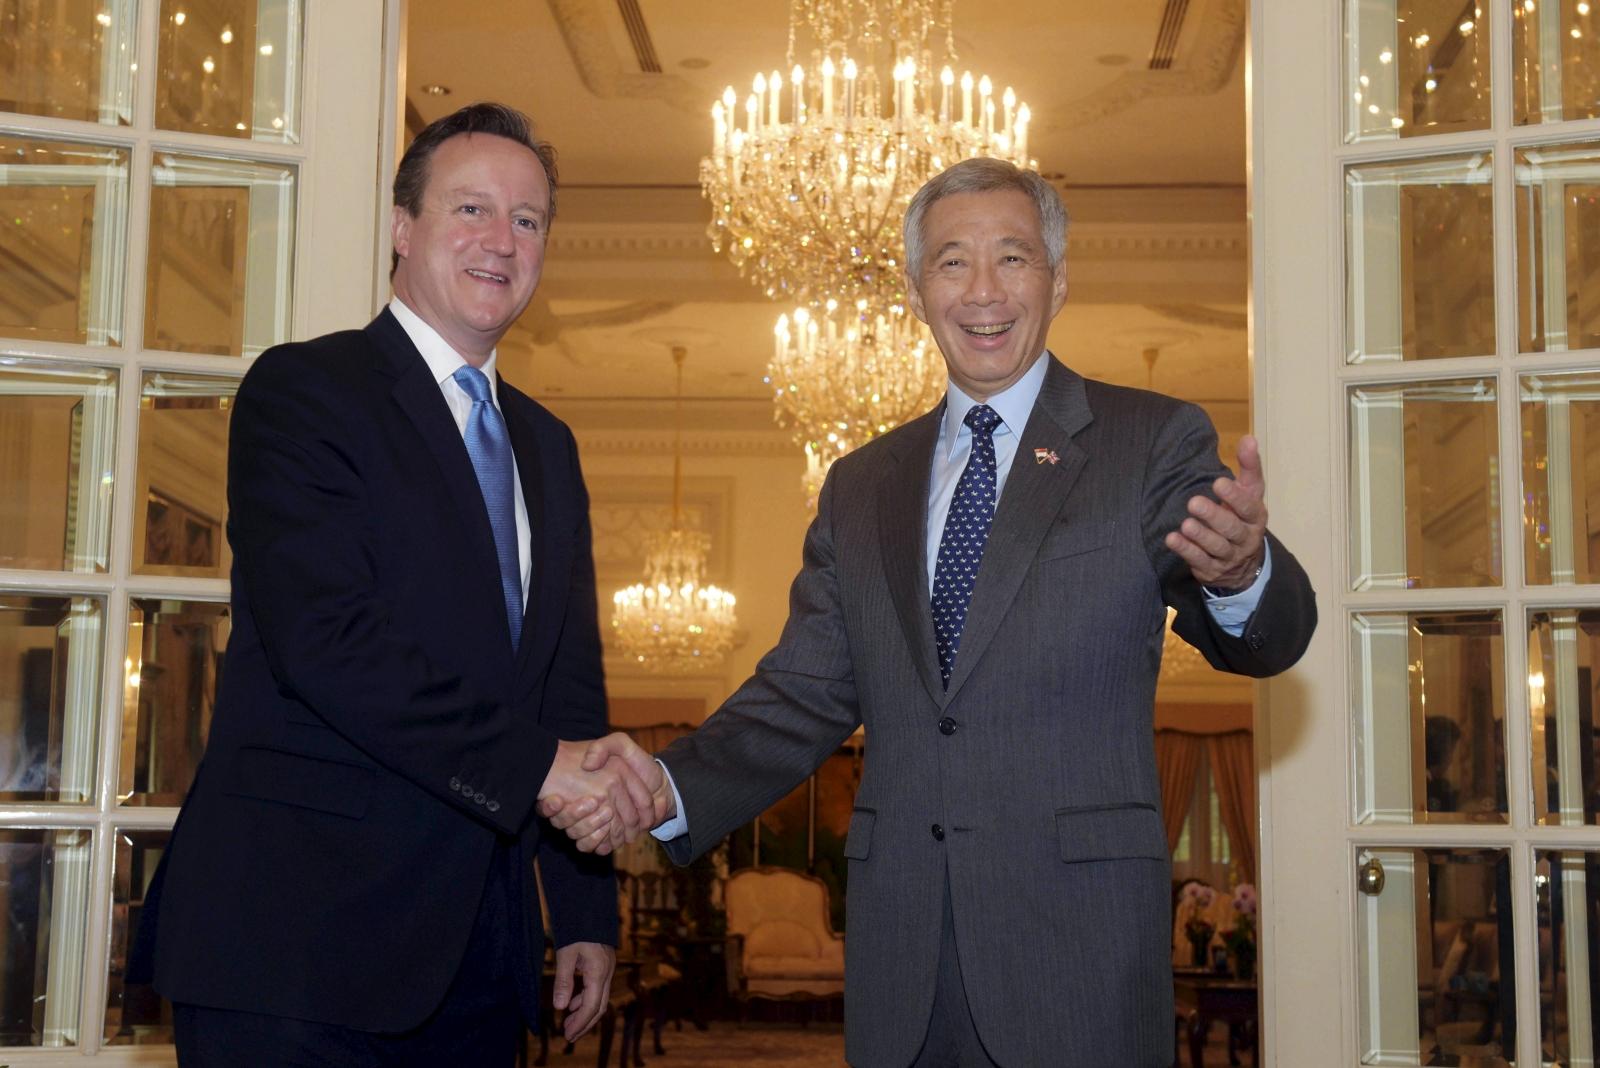 David Cameron Singapore visit